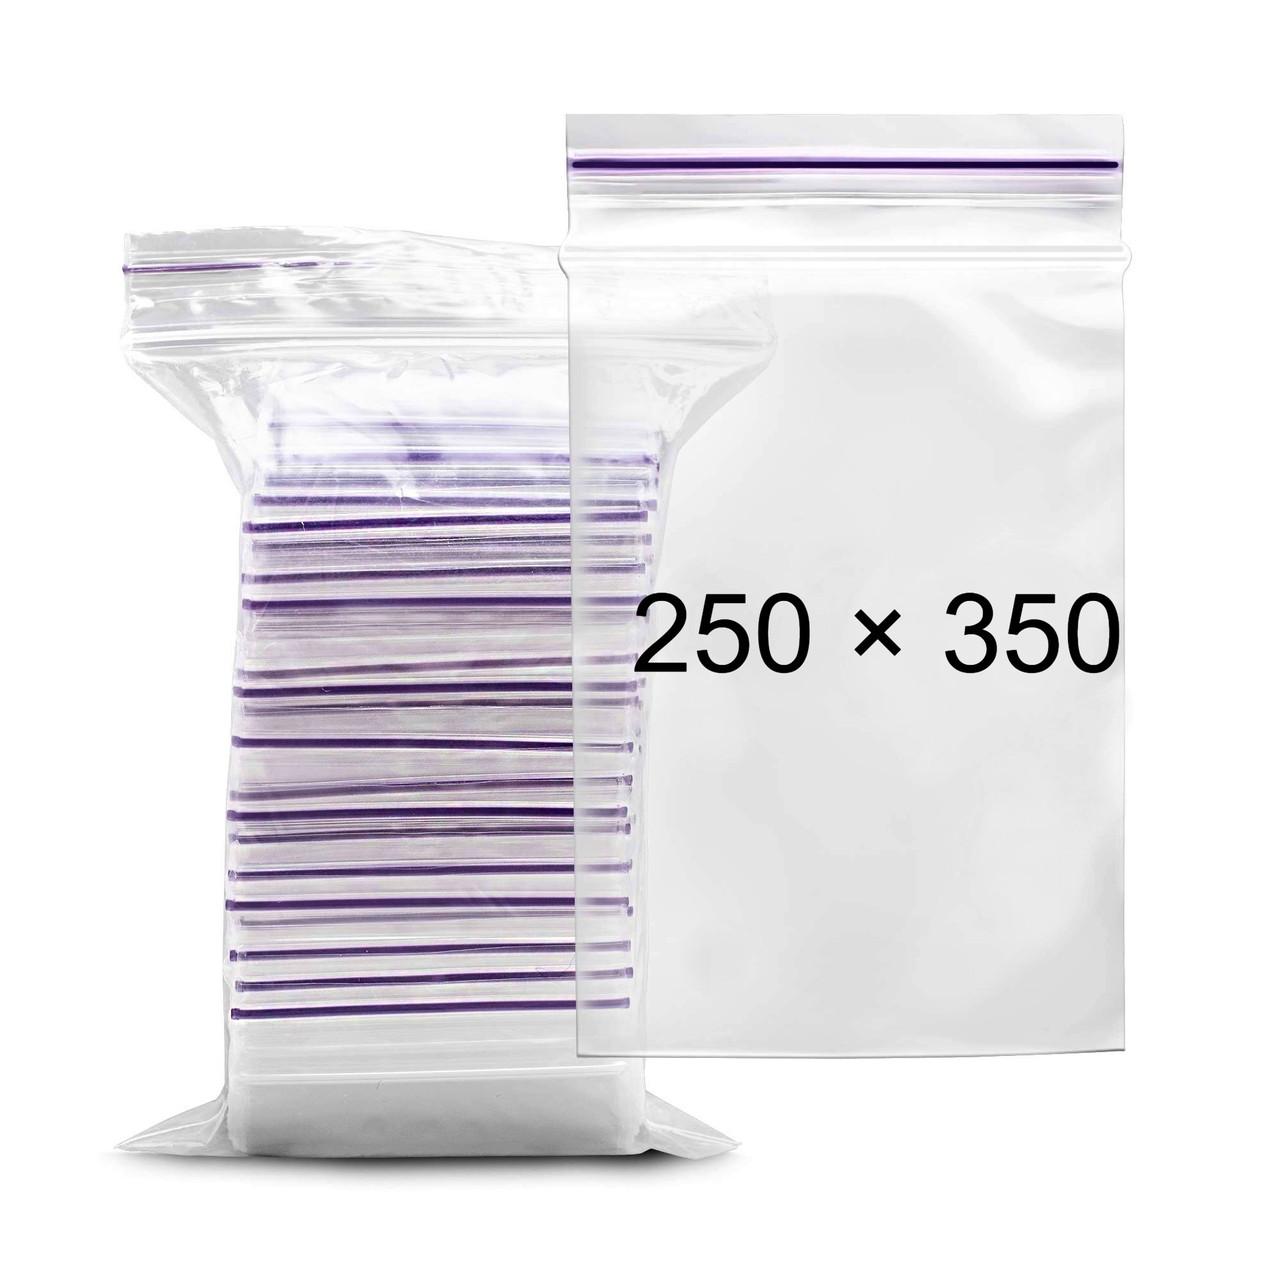 Пакеты с замком Zip-Lock - 250 × 350